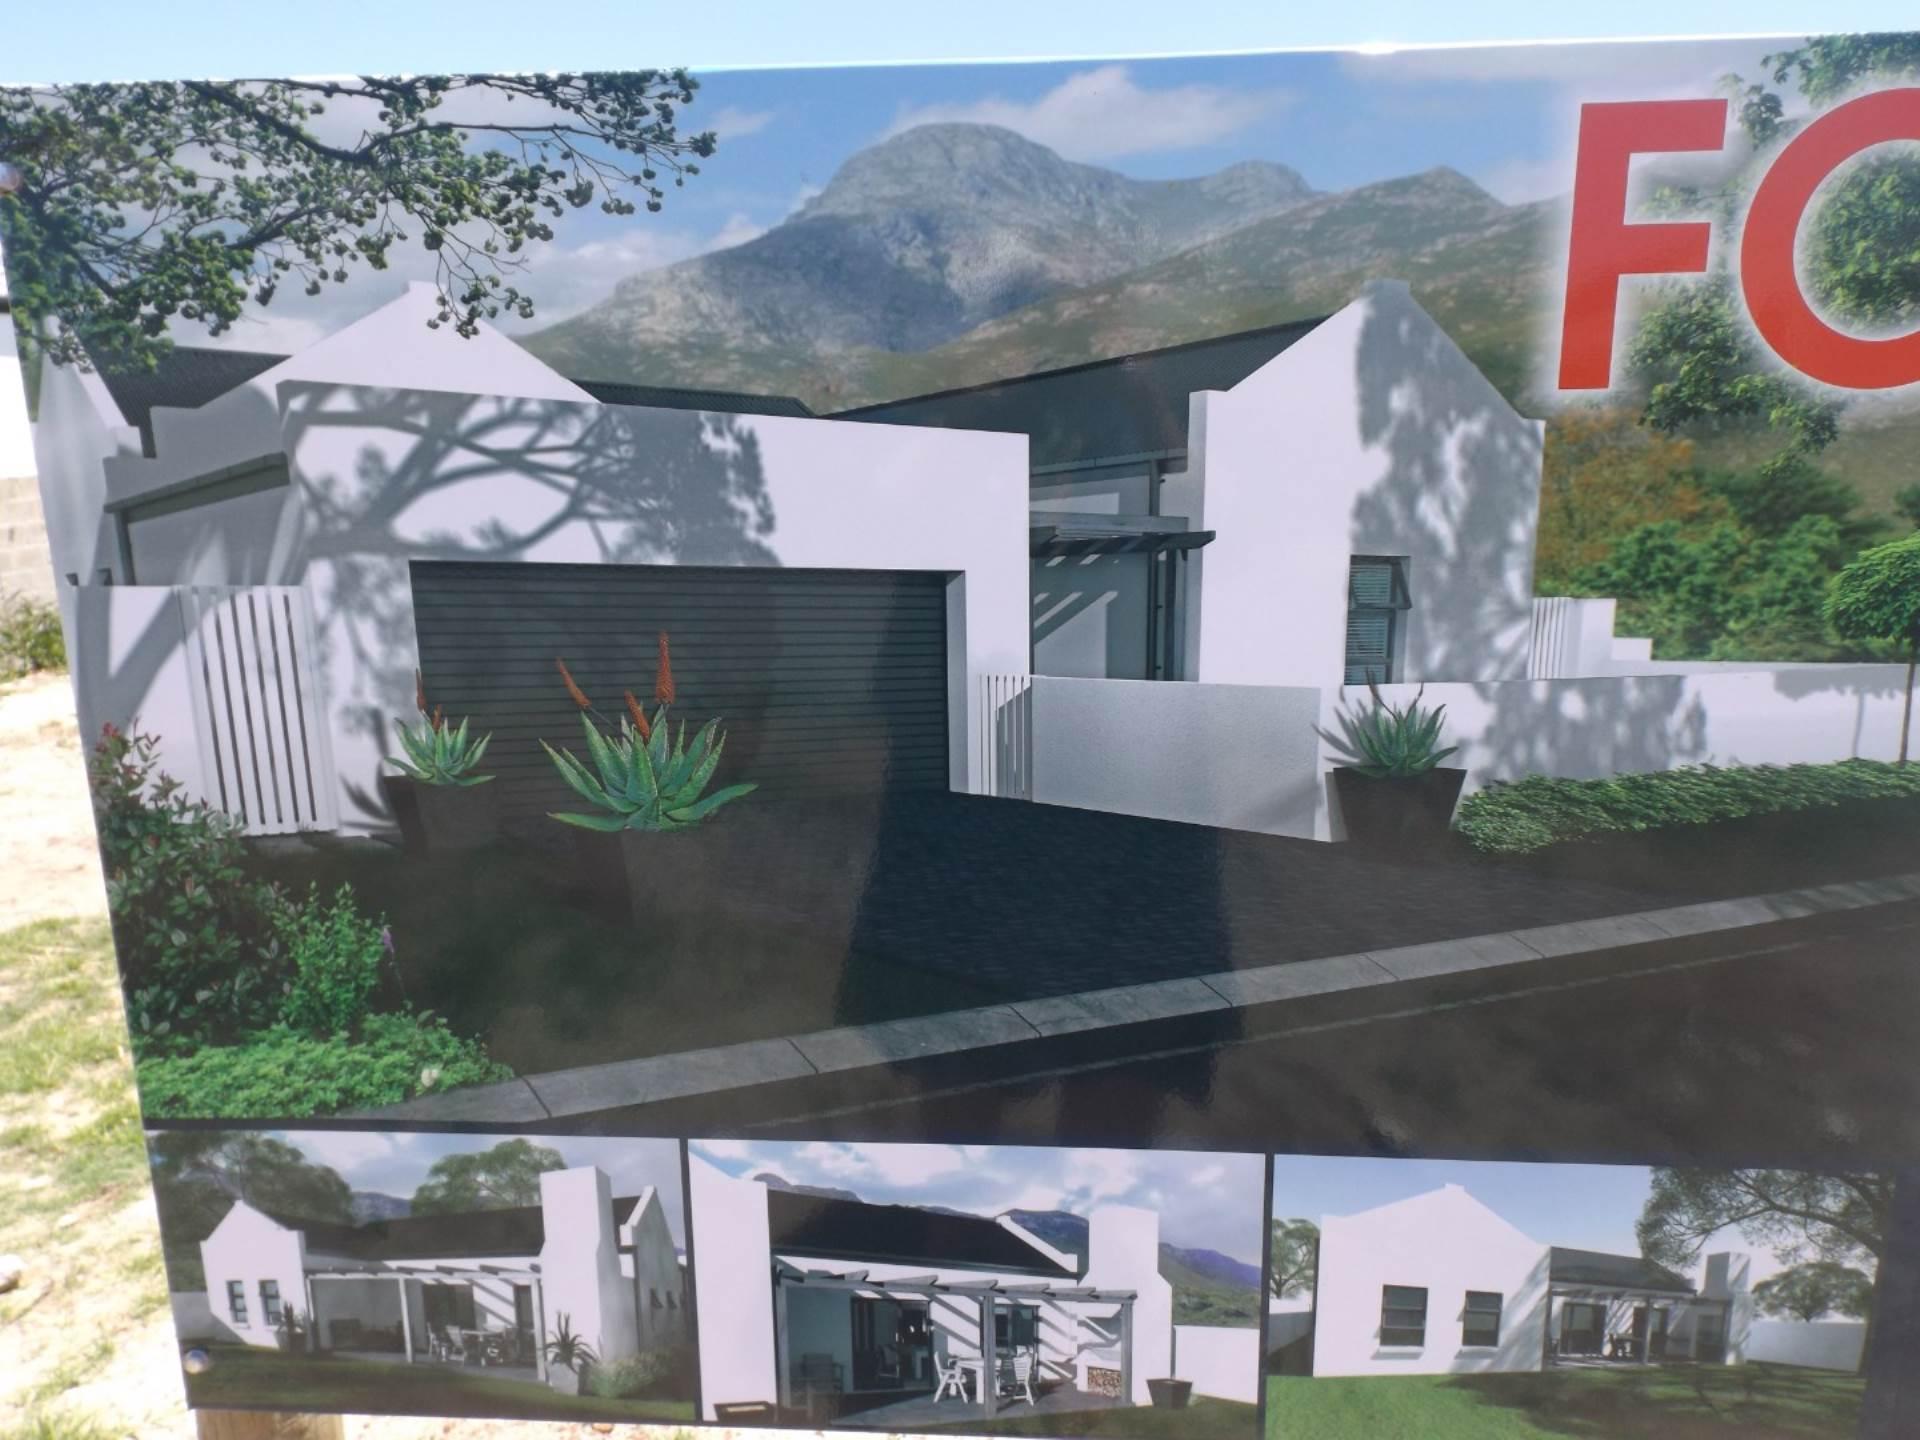 3 BedroomTownhouse For Sale In Sandbaai